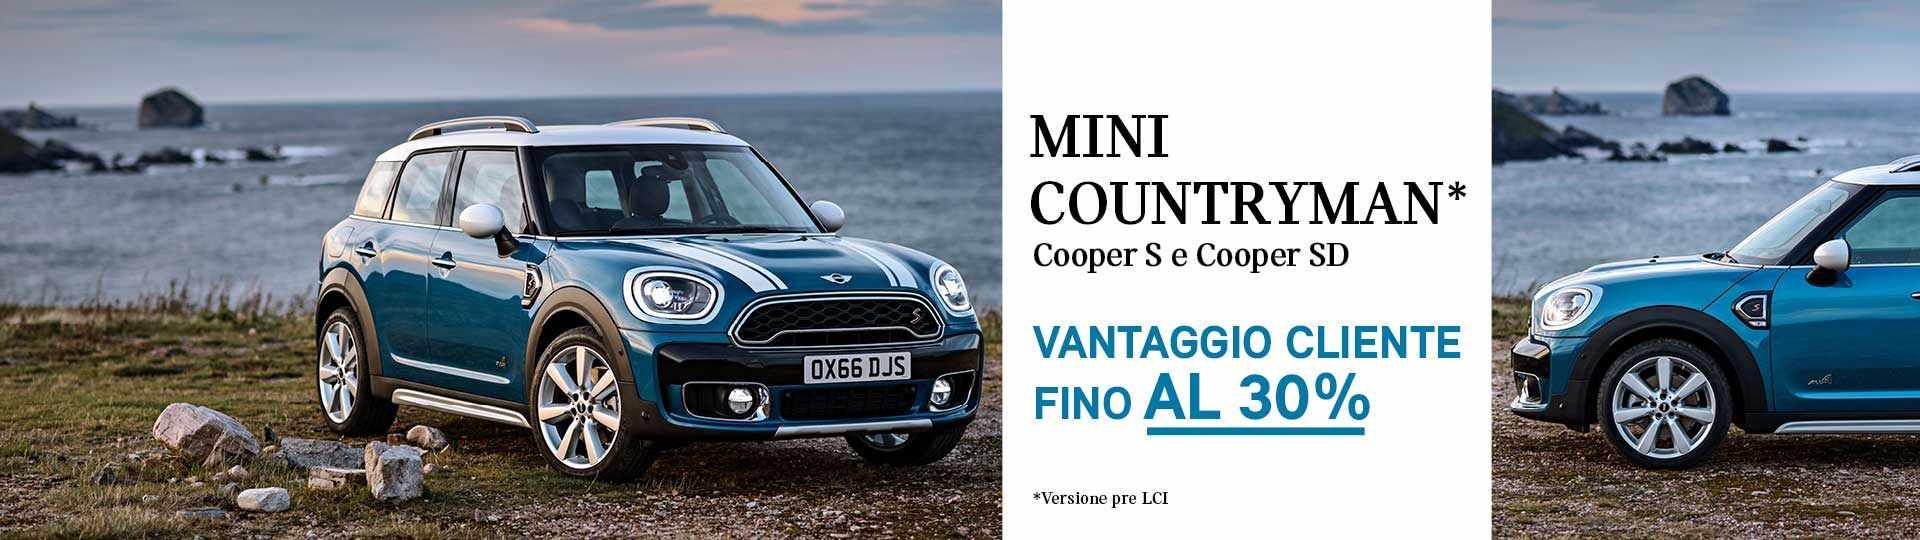 MINI-Countryman-F60-vecchia-min.jpg